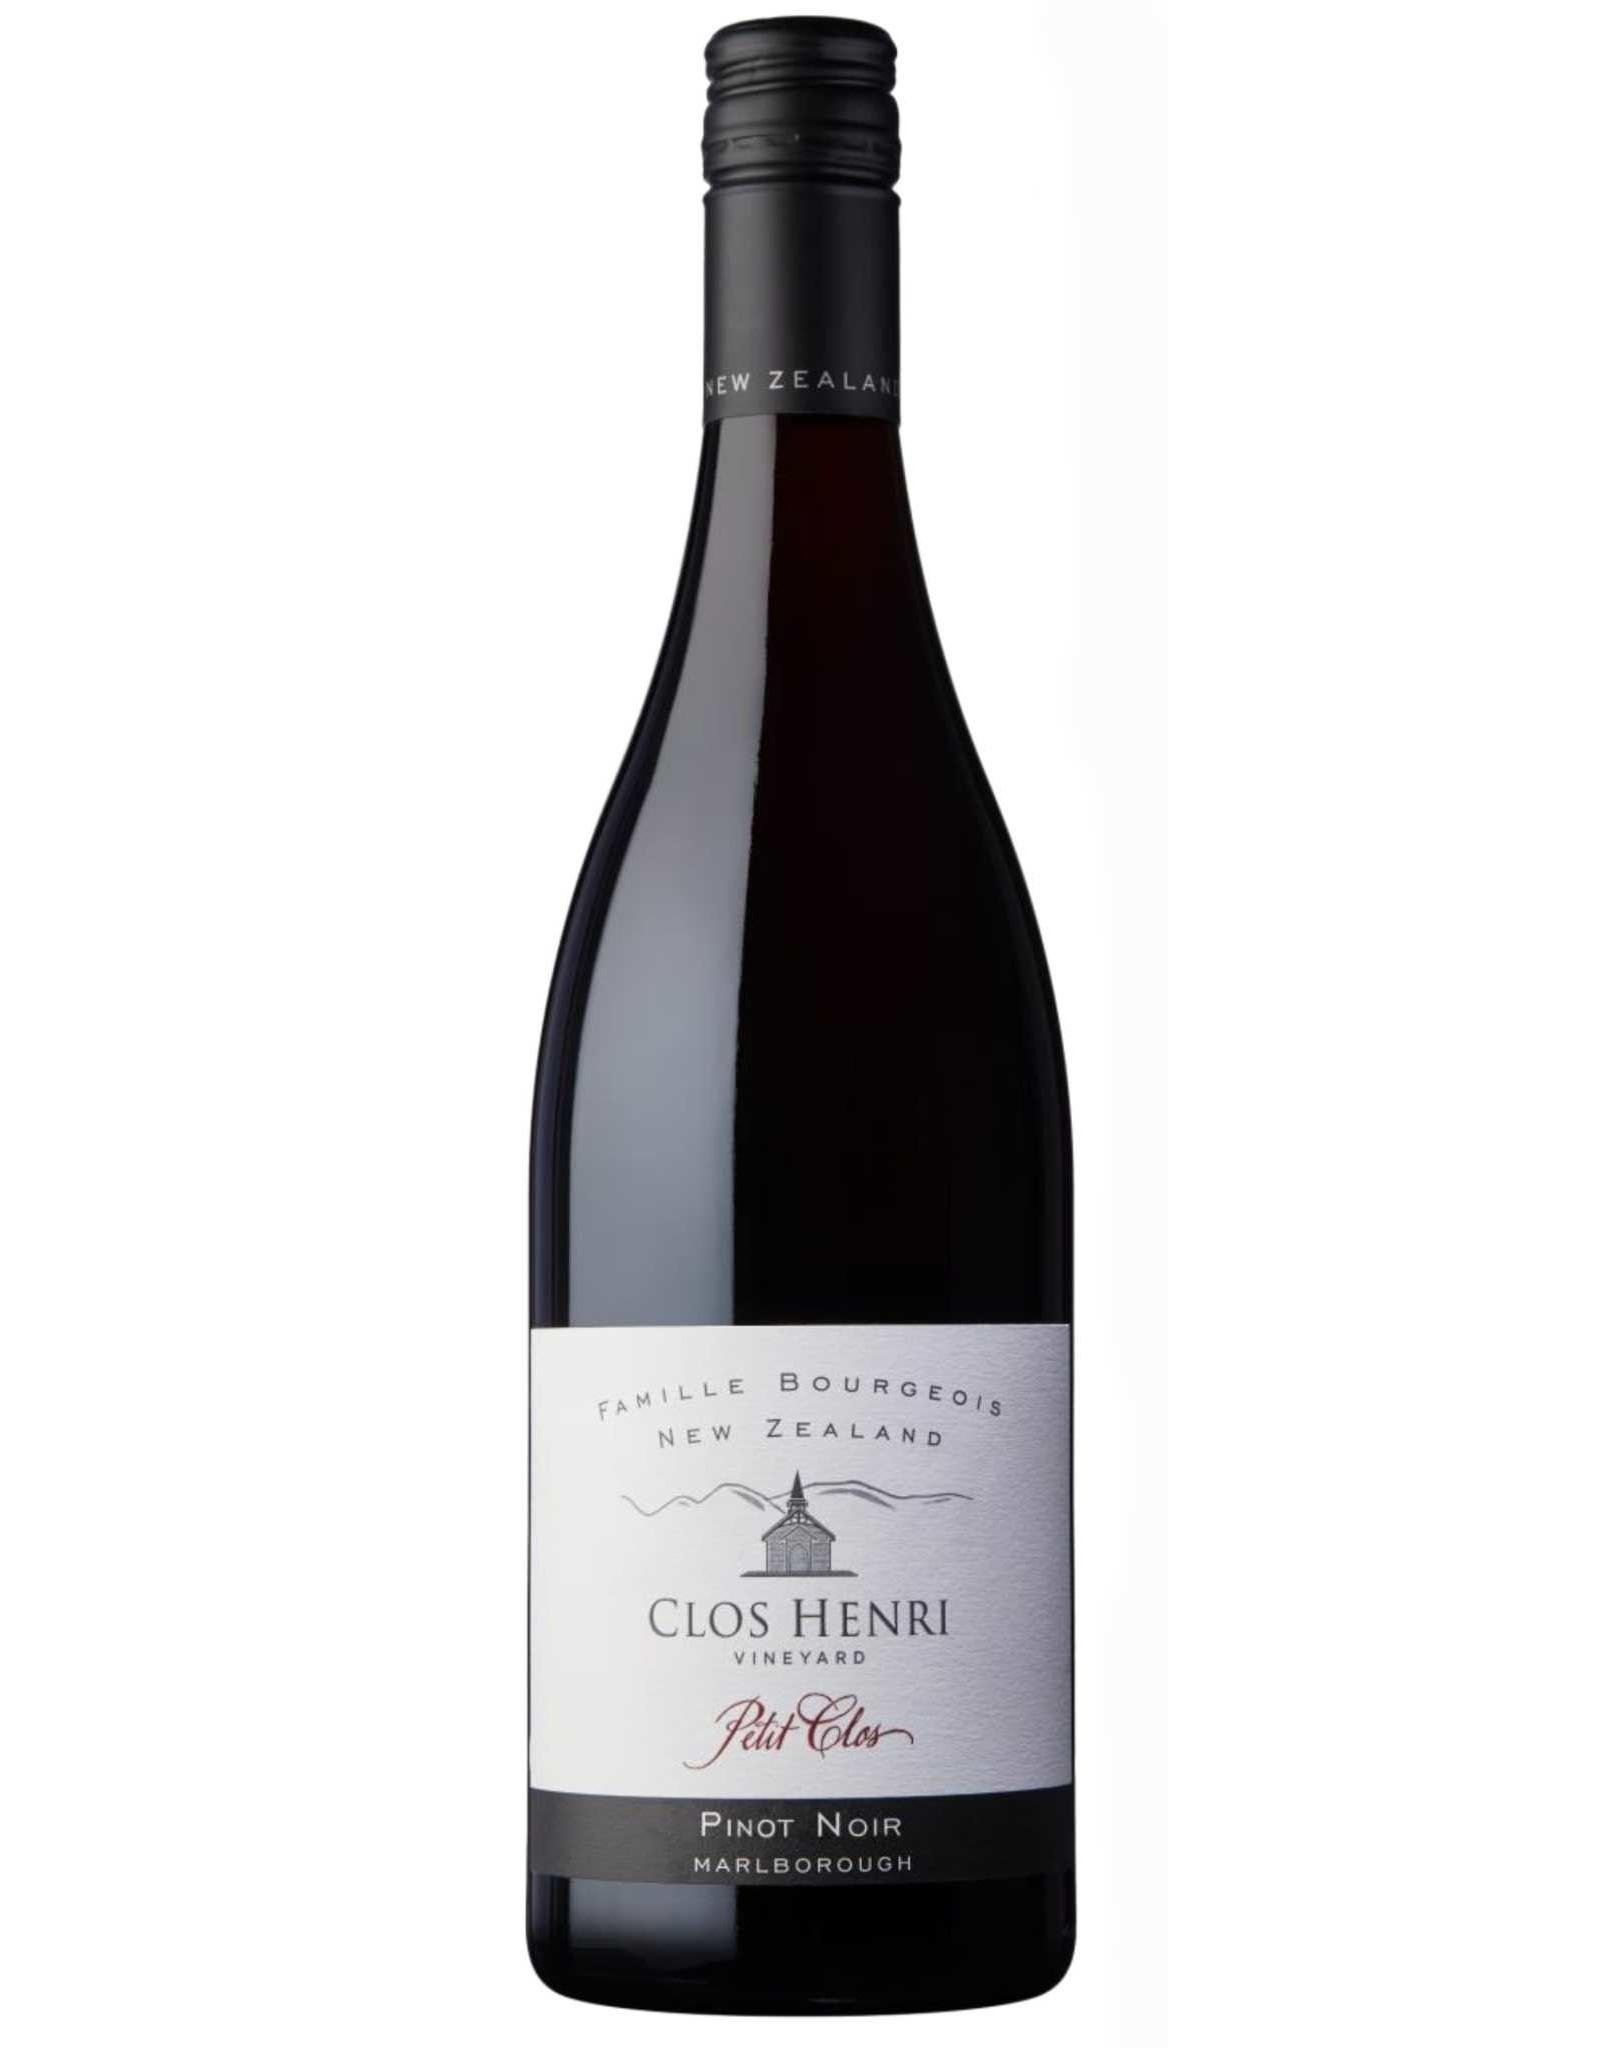 Clos Henri Clos Henri Petit Clos Pinot Noir, Marlborough 2019